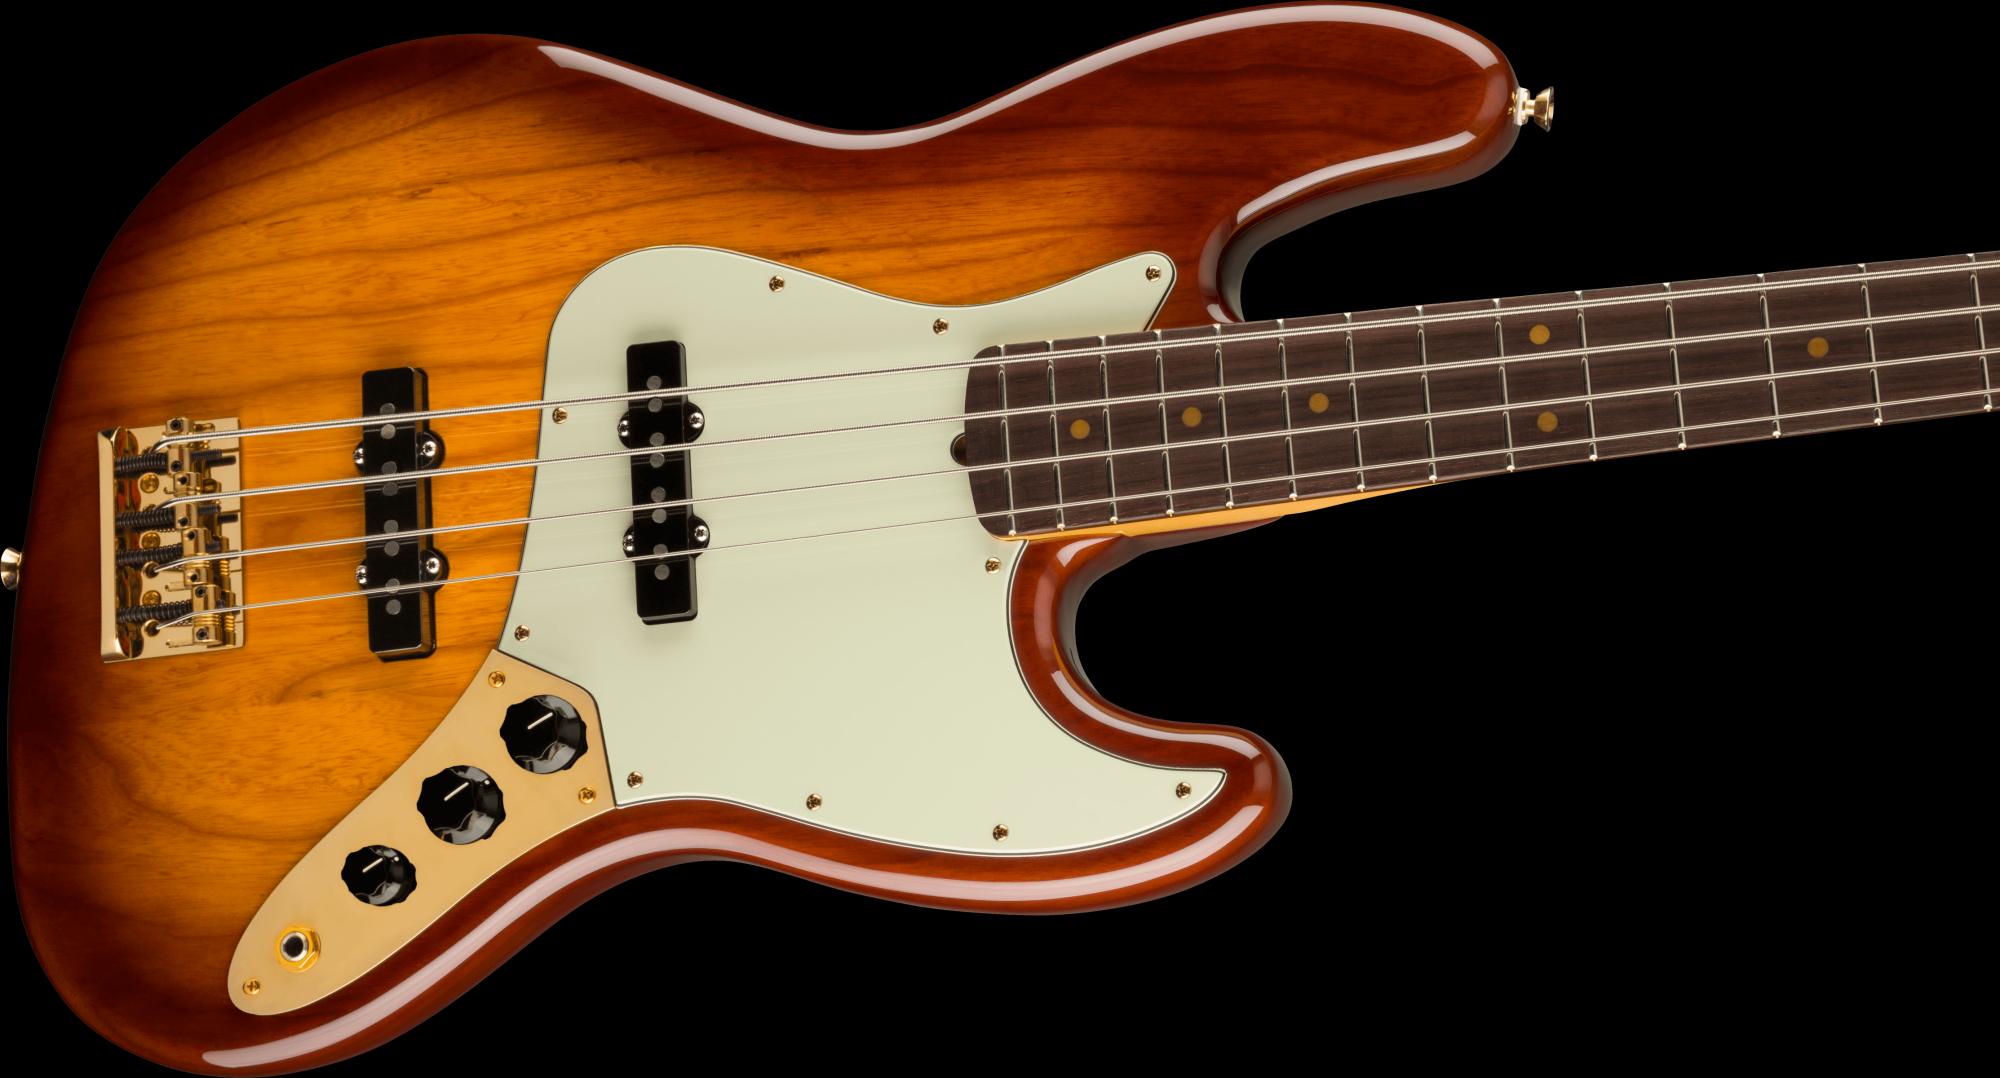 PRE-ORDER: Fender 75th Anniversary Commemorative Jazz Bass Rosewood Fingerboard - 2-Color Bourbon Burst